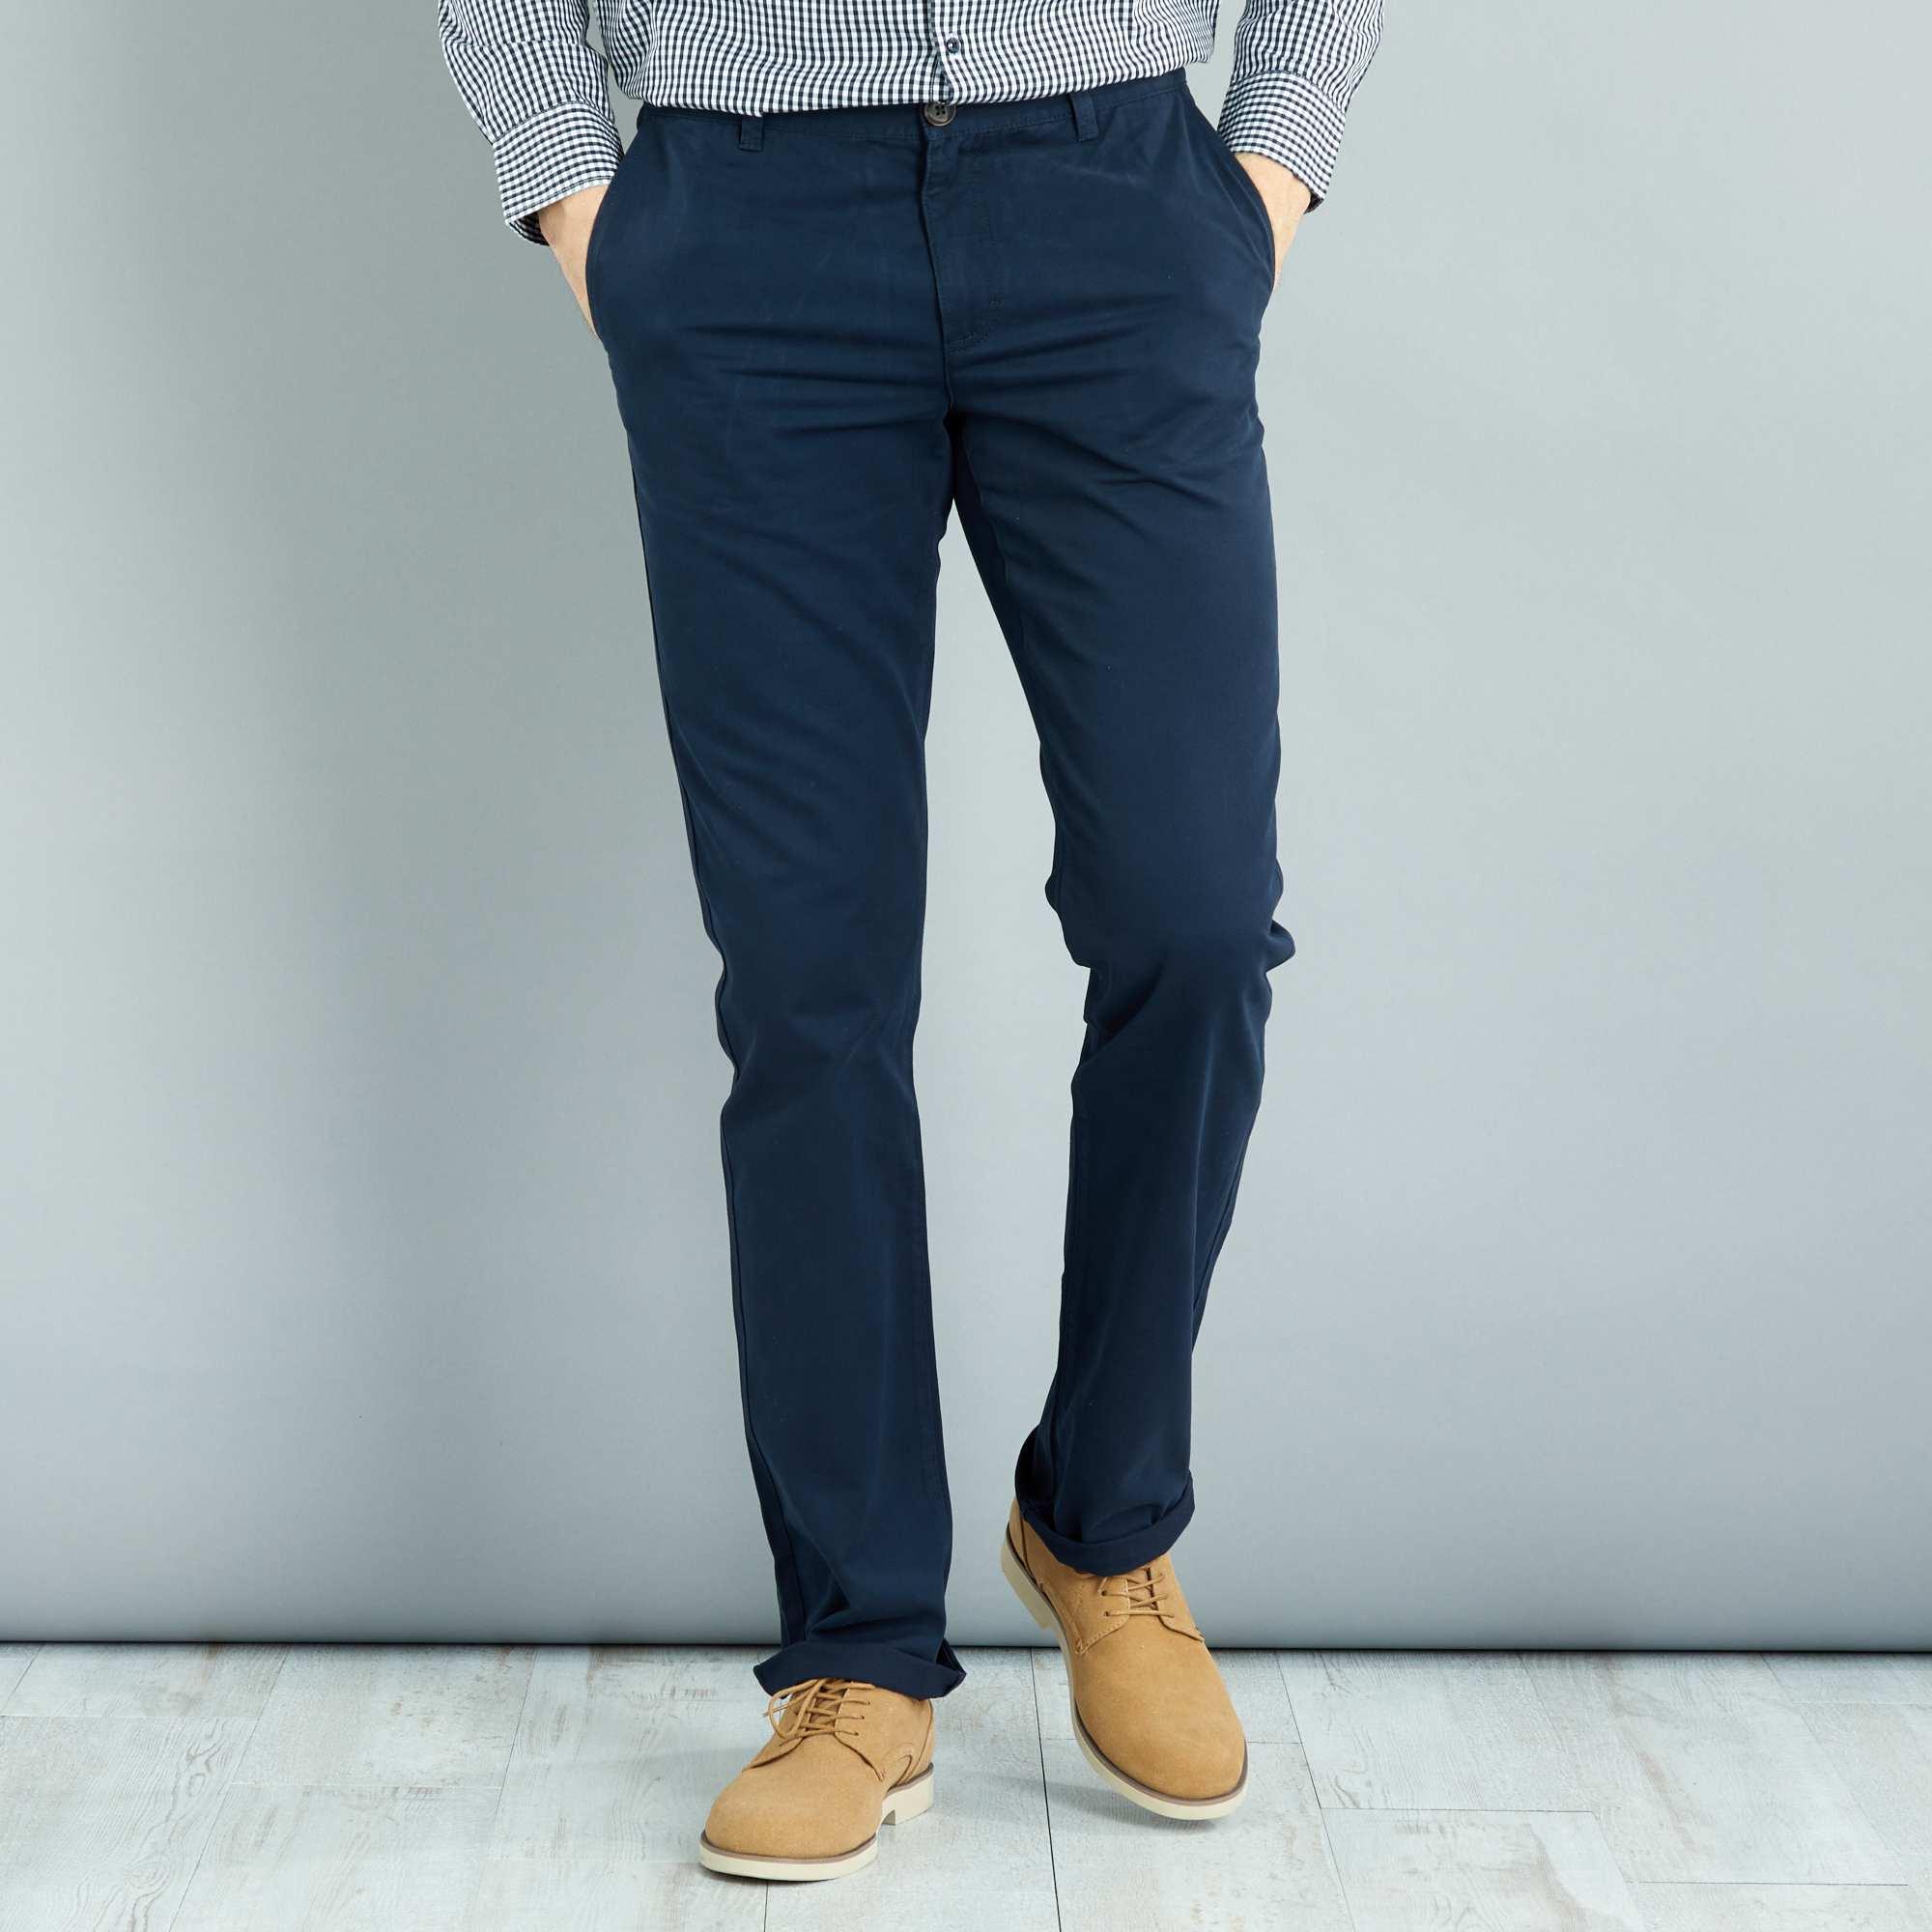 pantalon chino regular l38 1m90 homme bleu marine kiabi 22 00. Black Bedroom Furniture Sets. Home Design Ideas